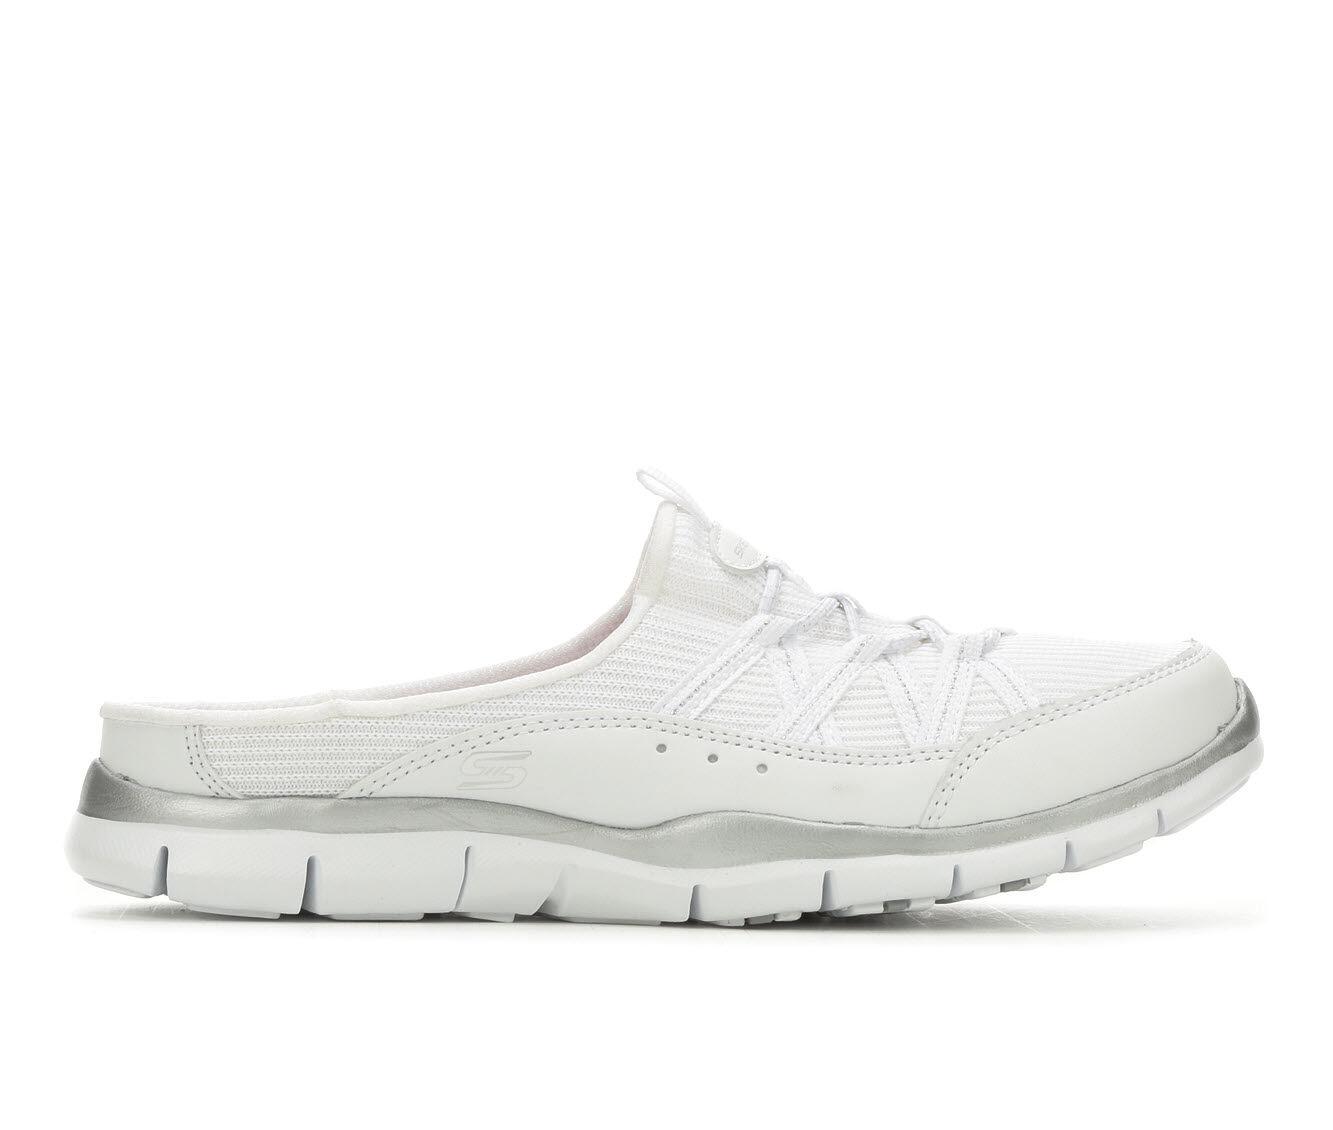 Women's Skechers Real Story 23777 Slip-On Sneakers White/Silver